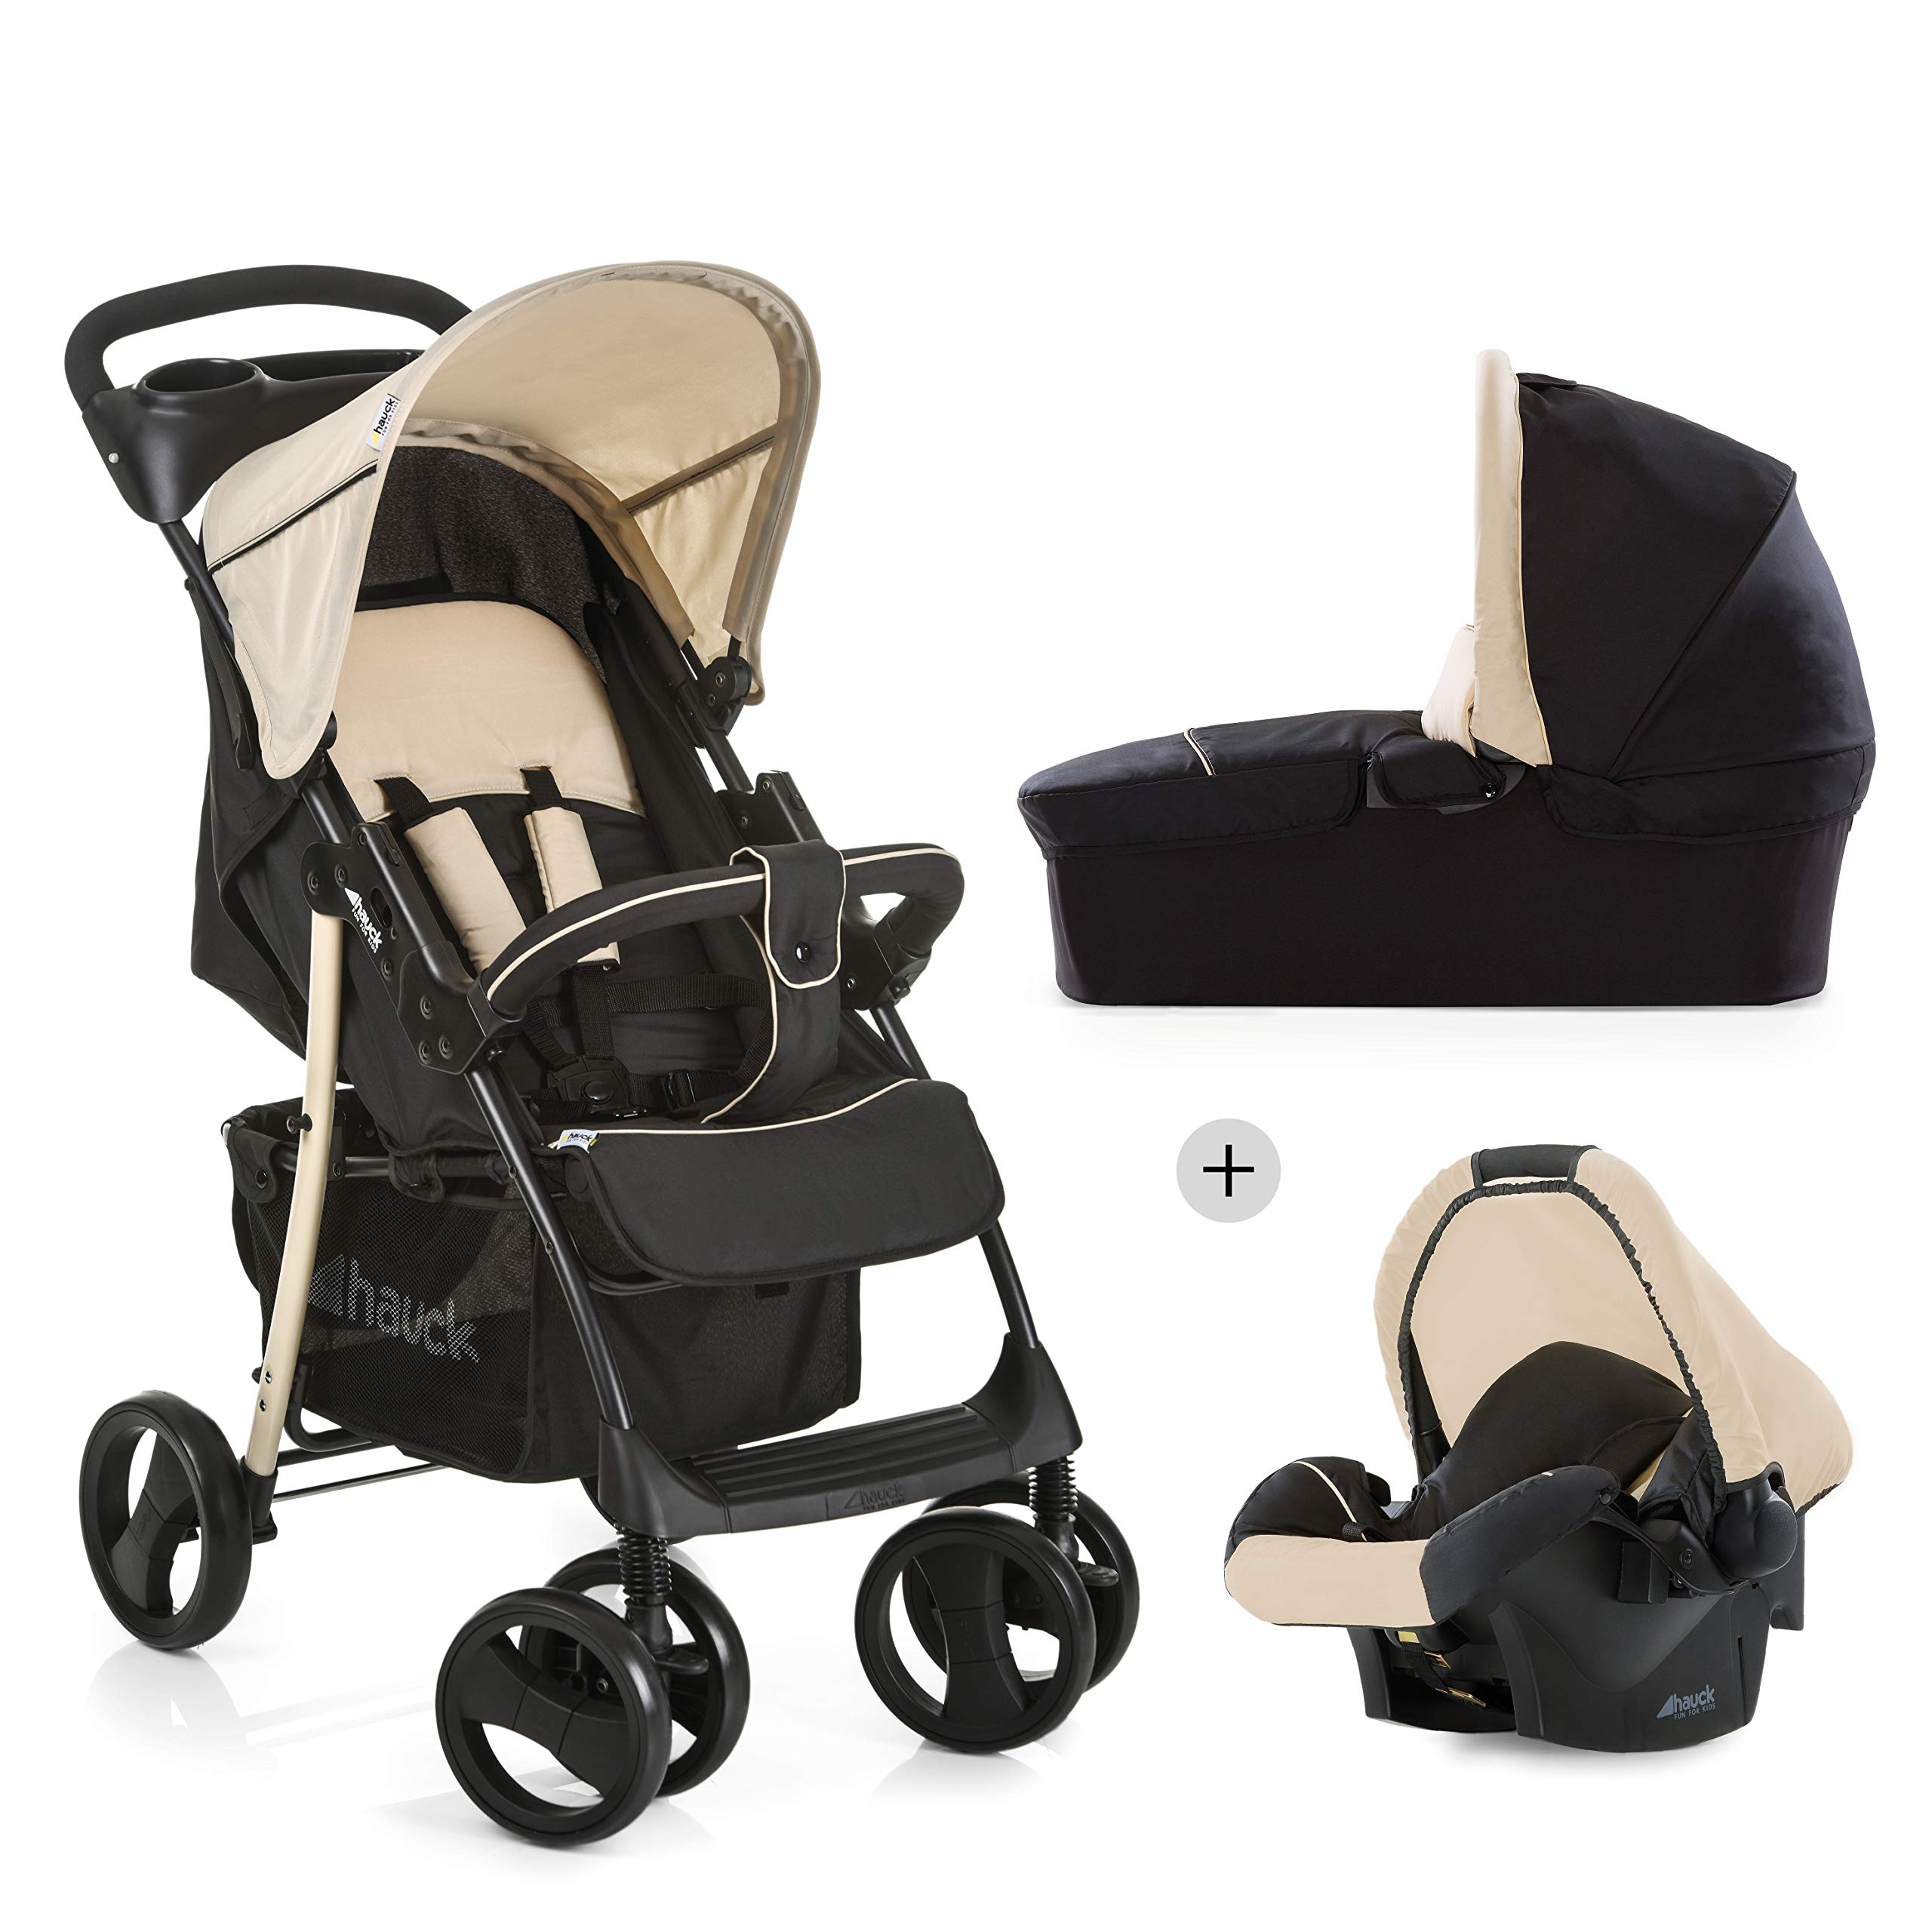 Hauck Shopper SLX trioset - Coche de bebes 3 piezas de capazo, de 0 meses